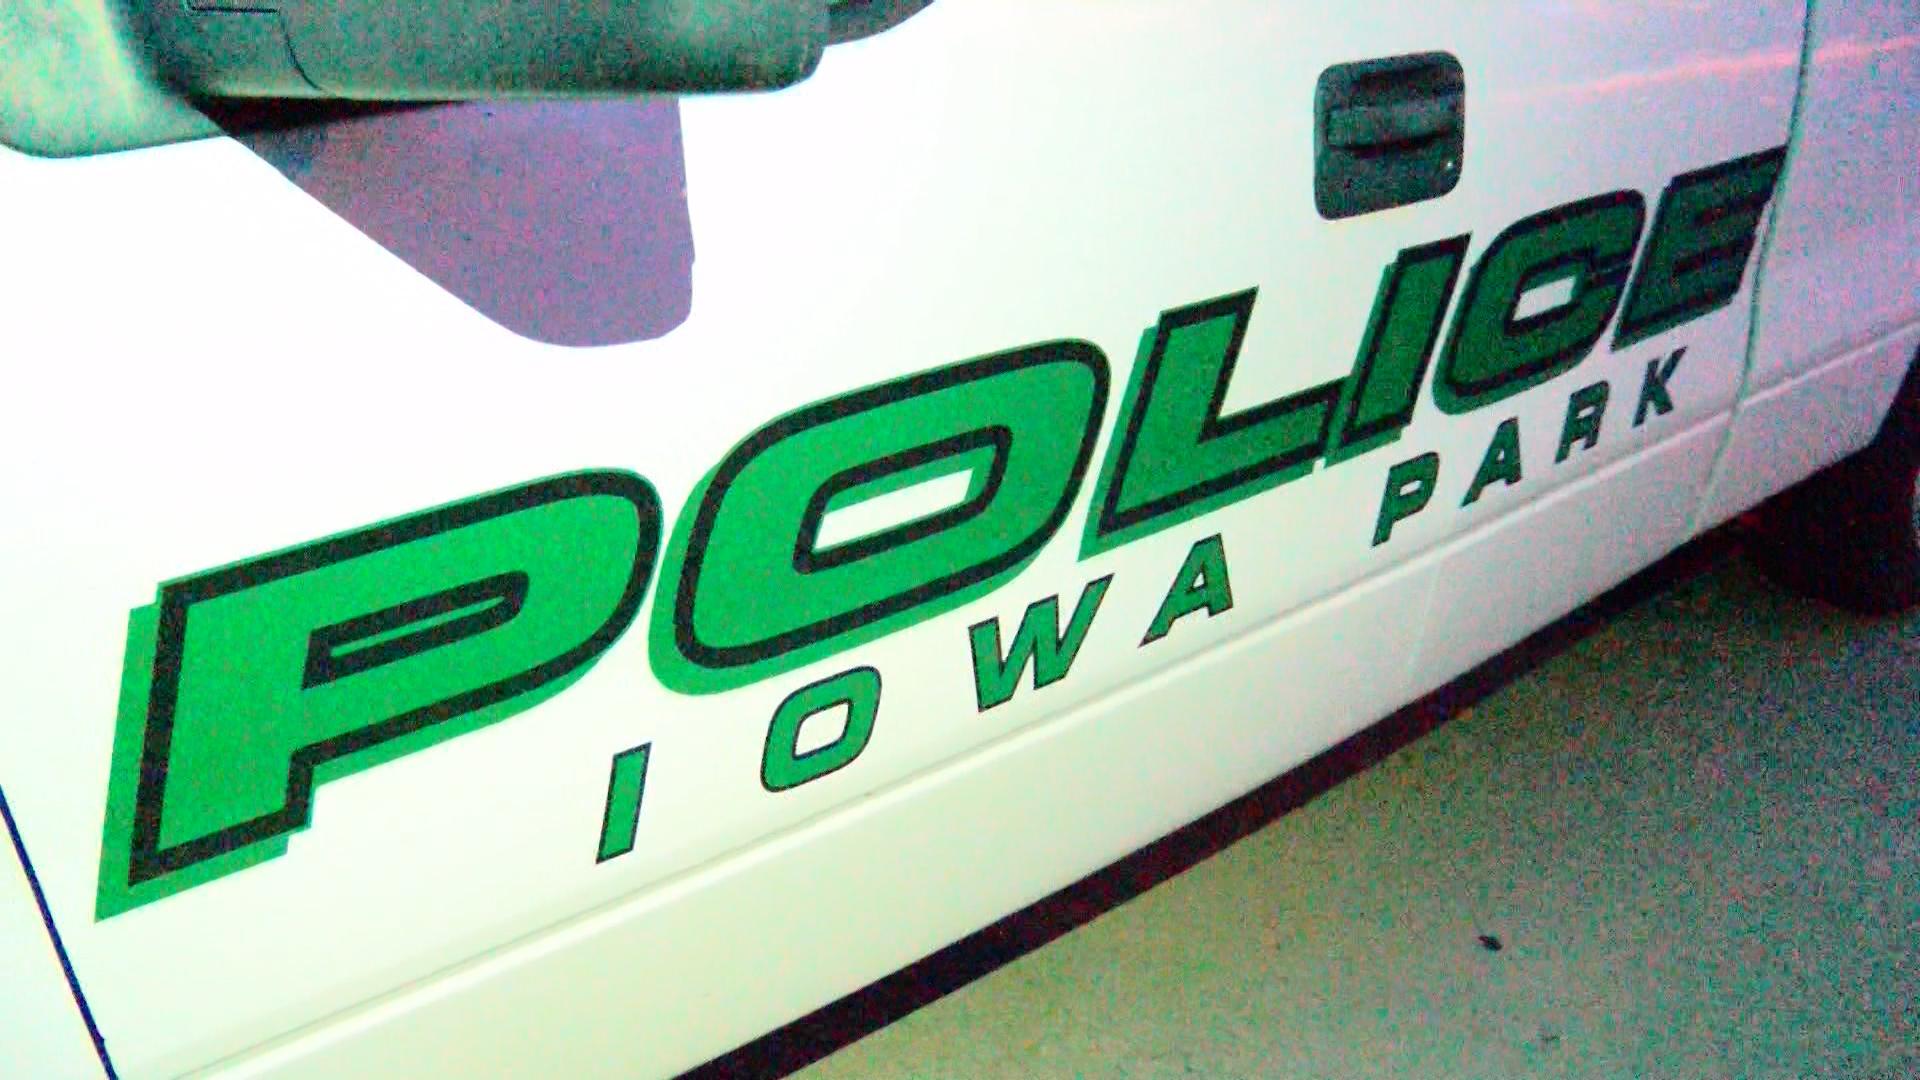 IOWA PARK POLICE_1540258504171.jpg.jpg